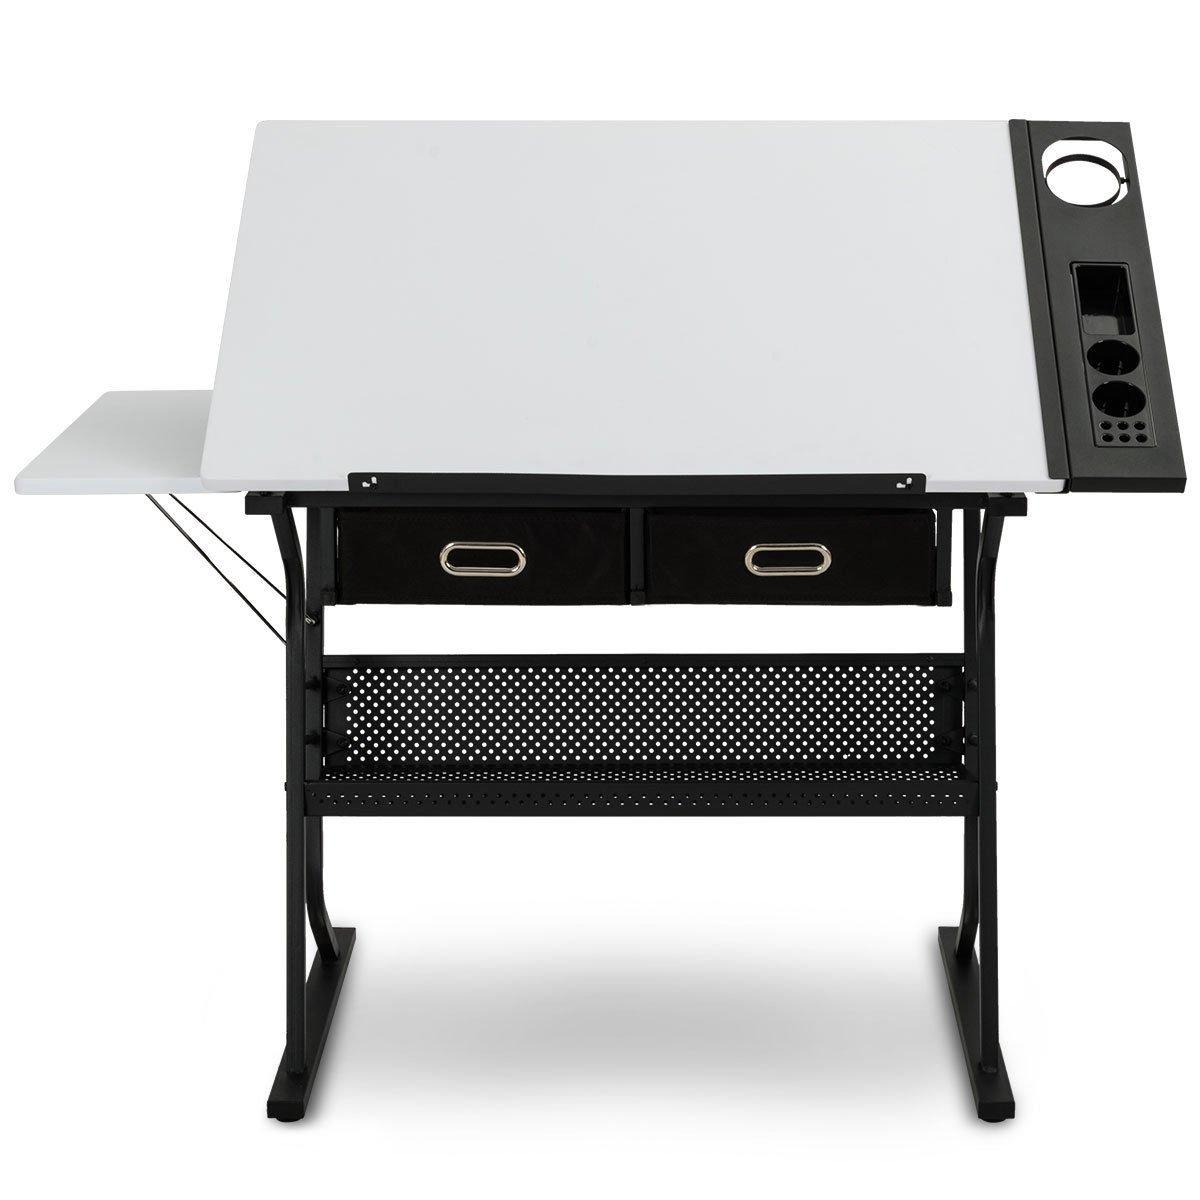 Tangkula Adjustable Drafting Table Art & Craft Drawing Desk Folding with Drawers by TANGKULA